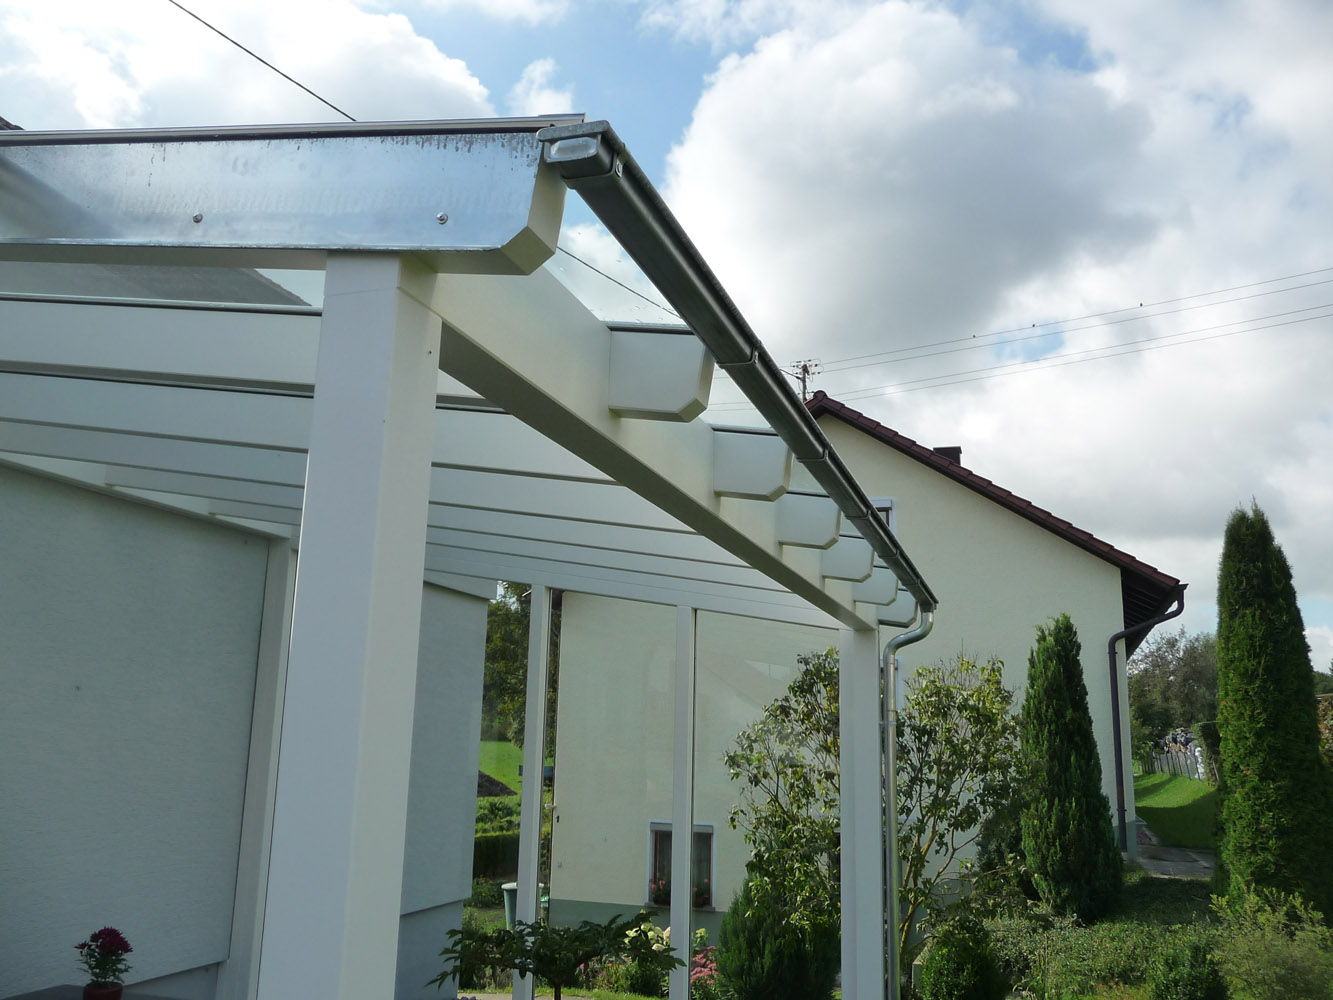 terrassenuberdachung an dachsparren befestigen, plandesign   moderner holzbau - ausführungsdetails, Design ideen